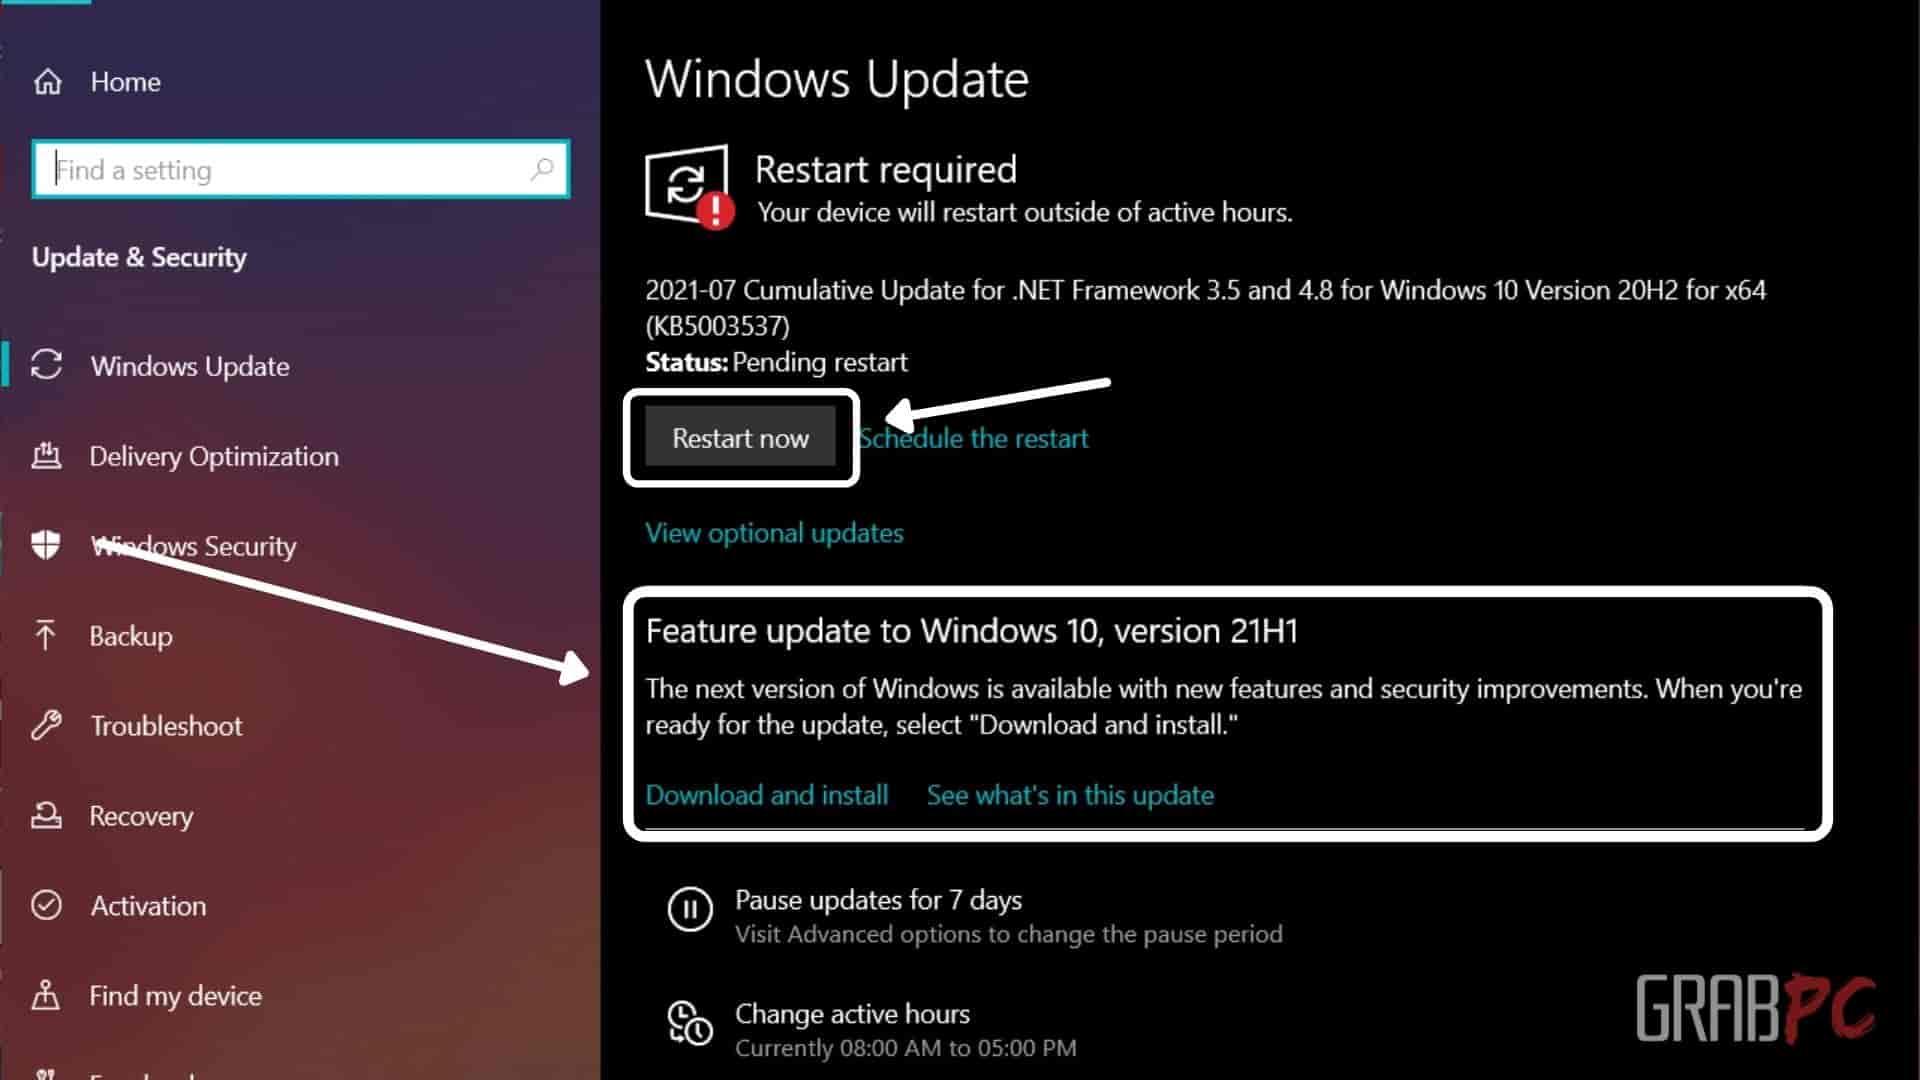 update settings menu